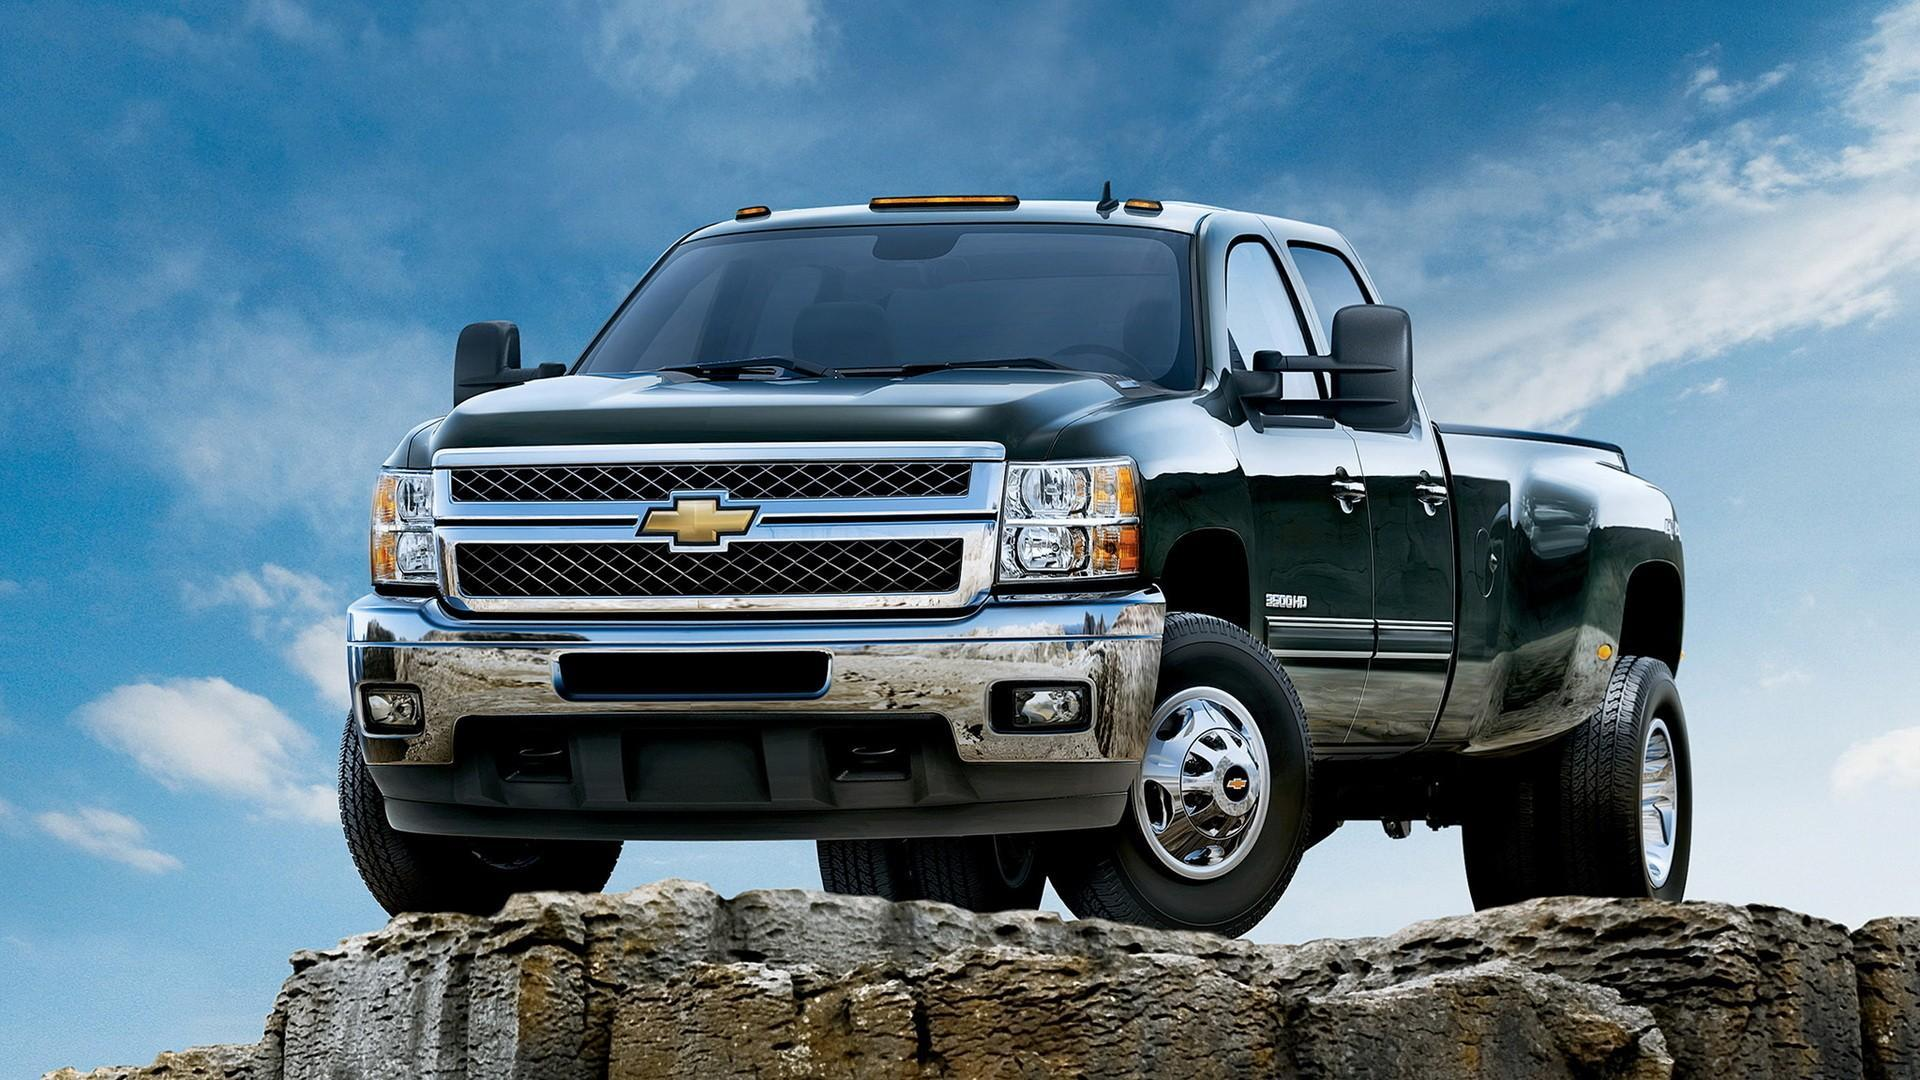 Chevrolet Trucks Wallpapers Top Free Chevrolet Trucks Backgrounds Wallpaperaccess